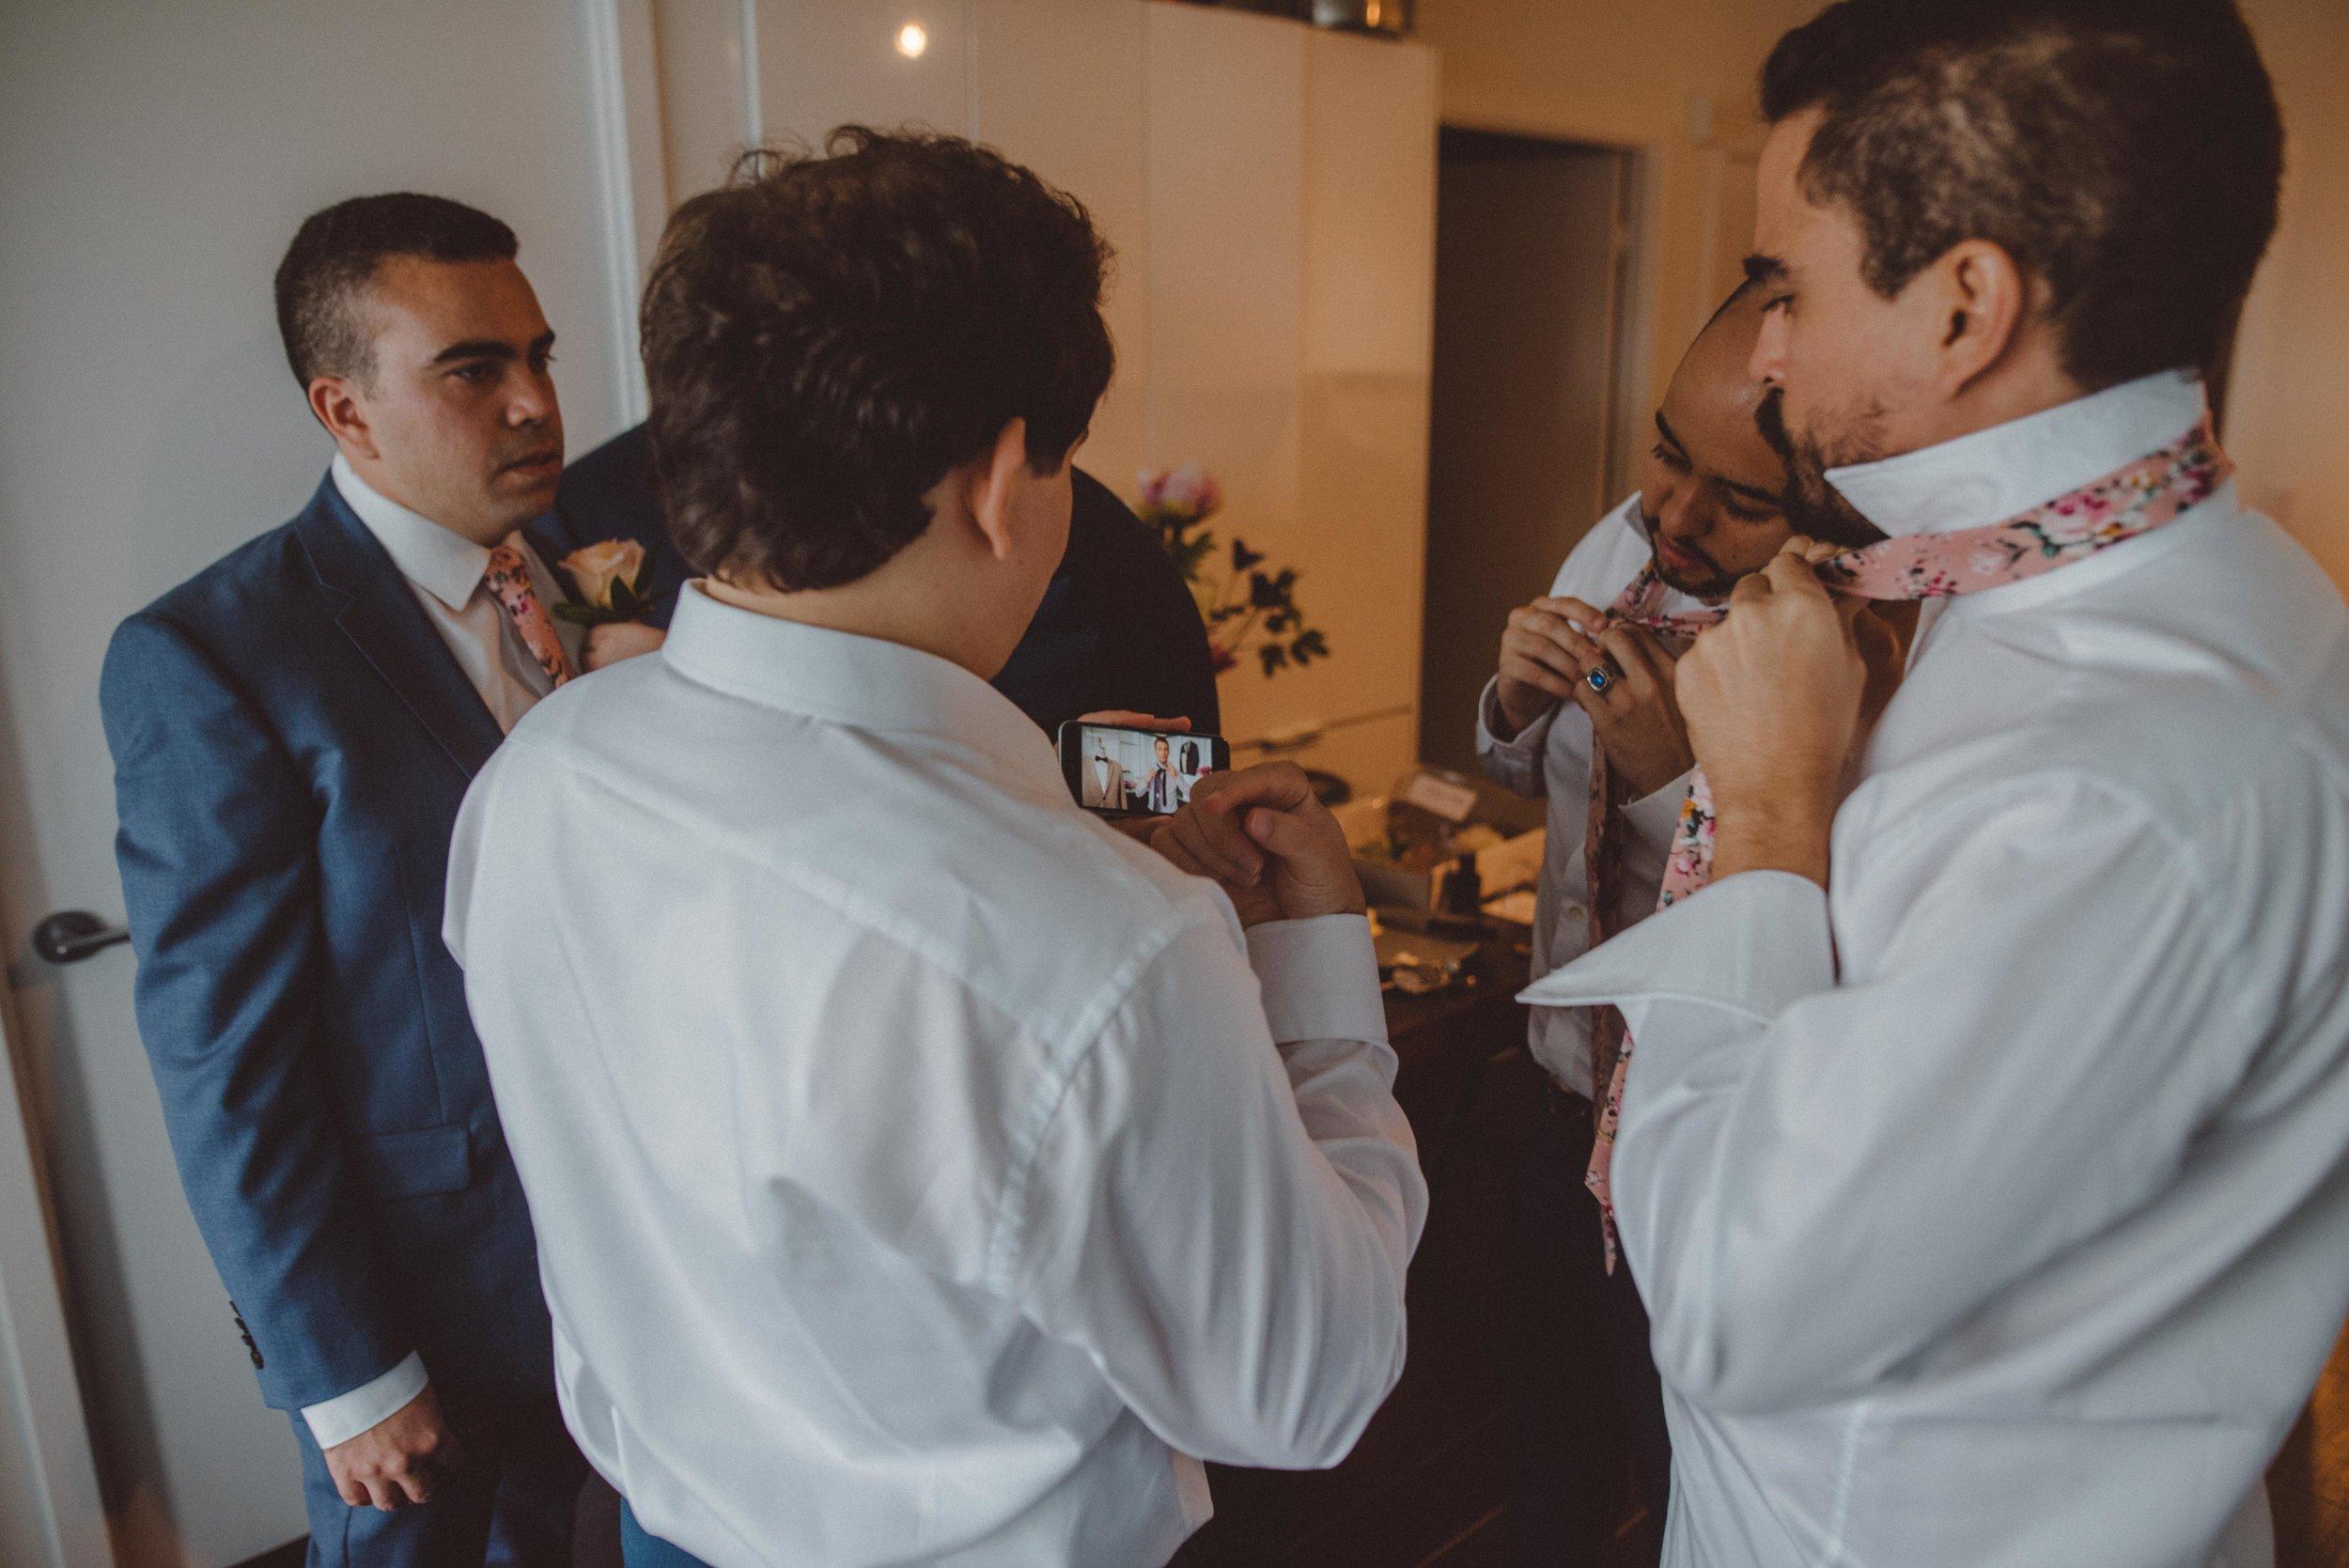 mariage_photographe_toronto_gatineau_ottawa_photographer_wedding-47.jpg